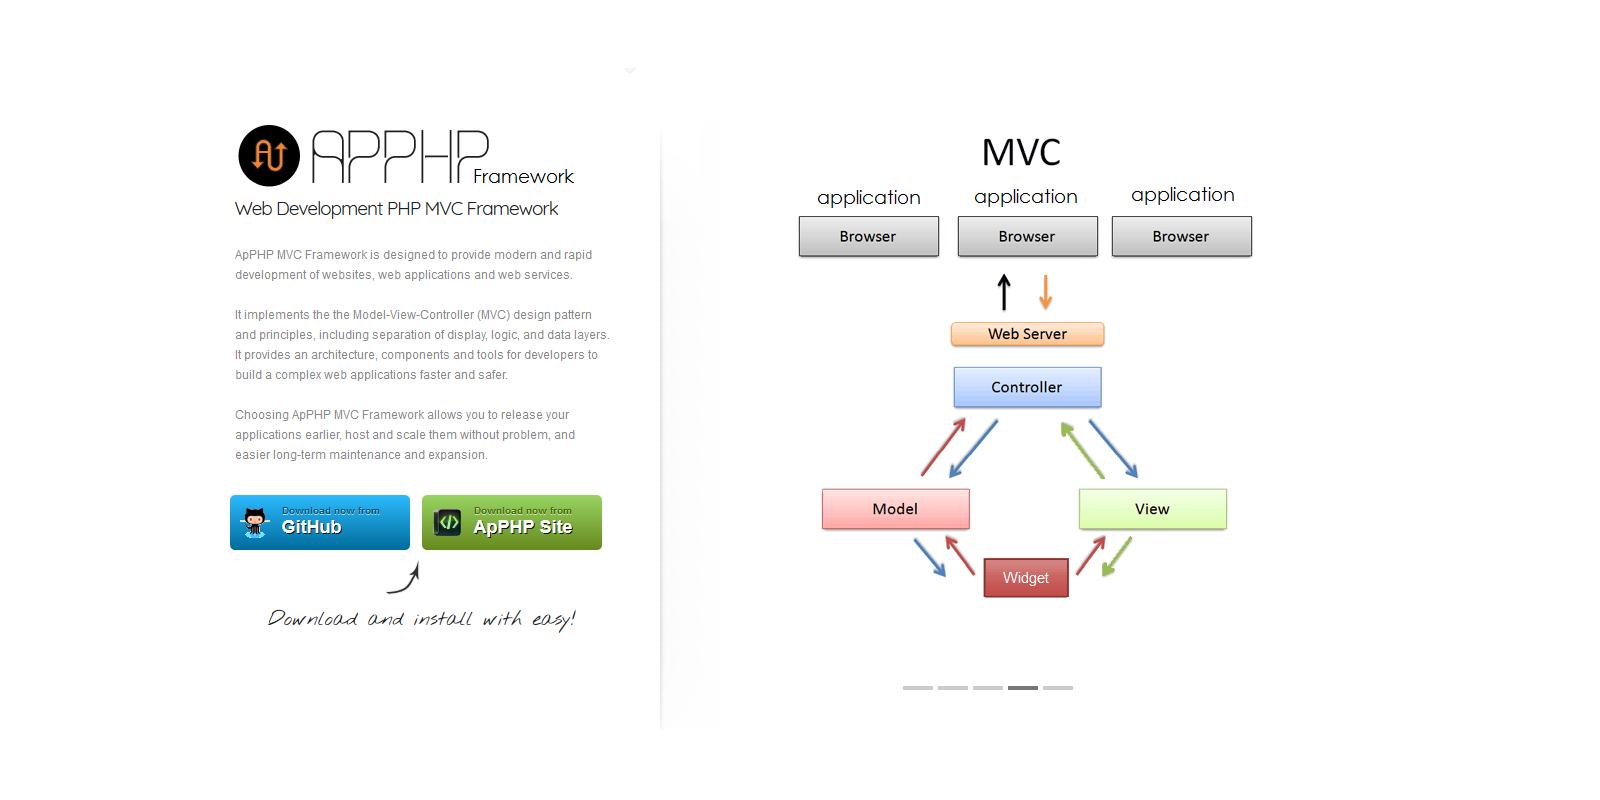 ApPHP MVC Framework